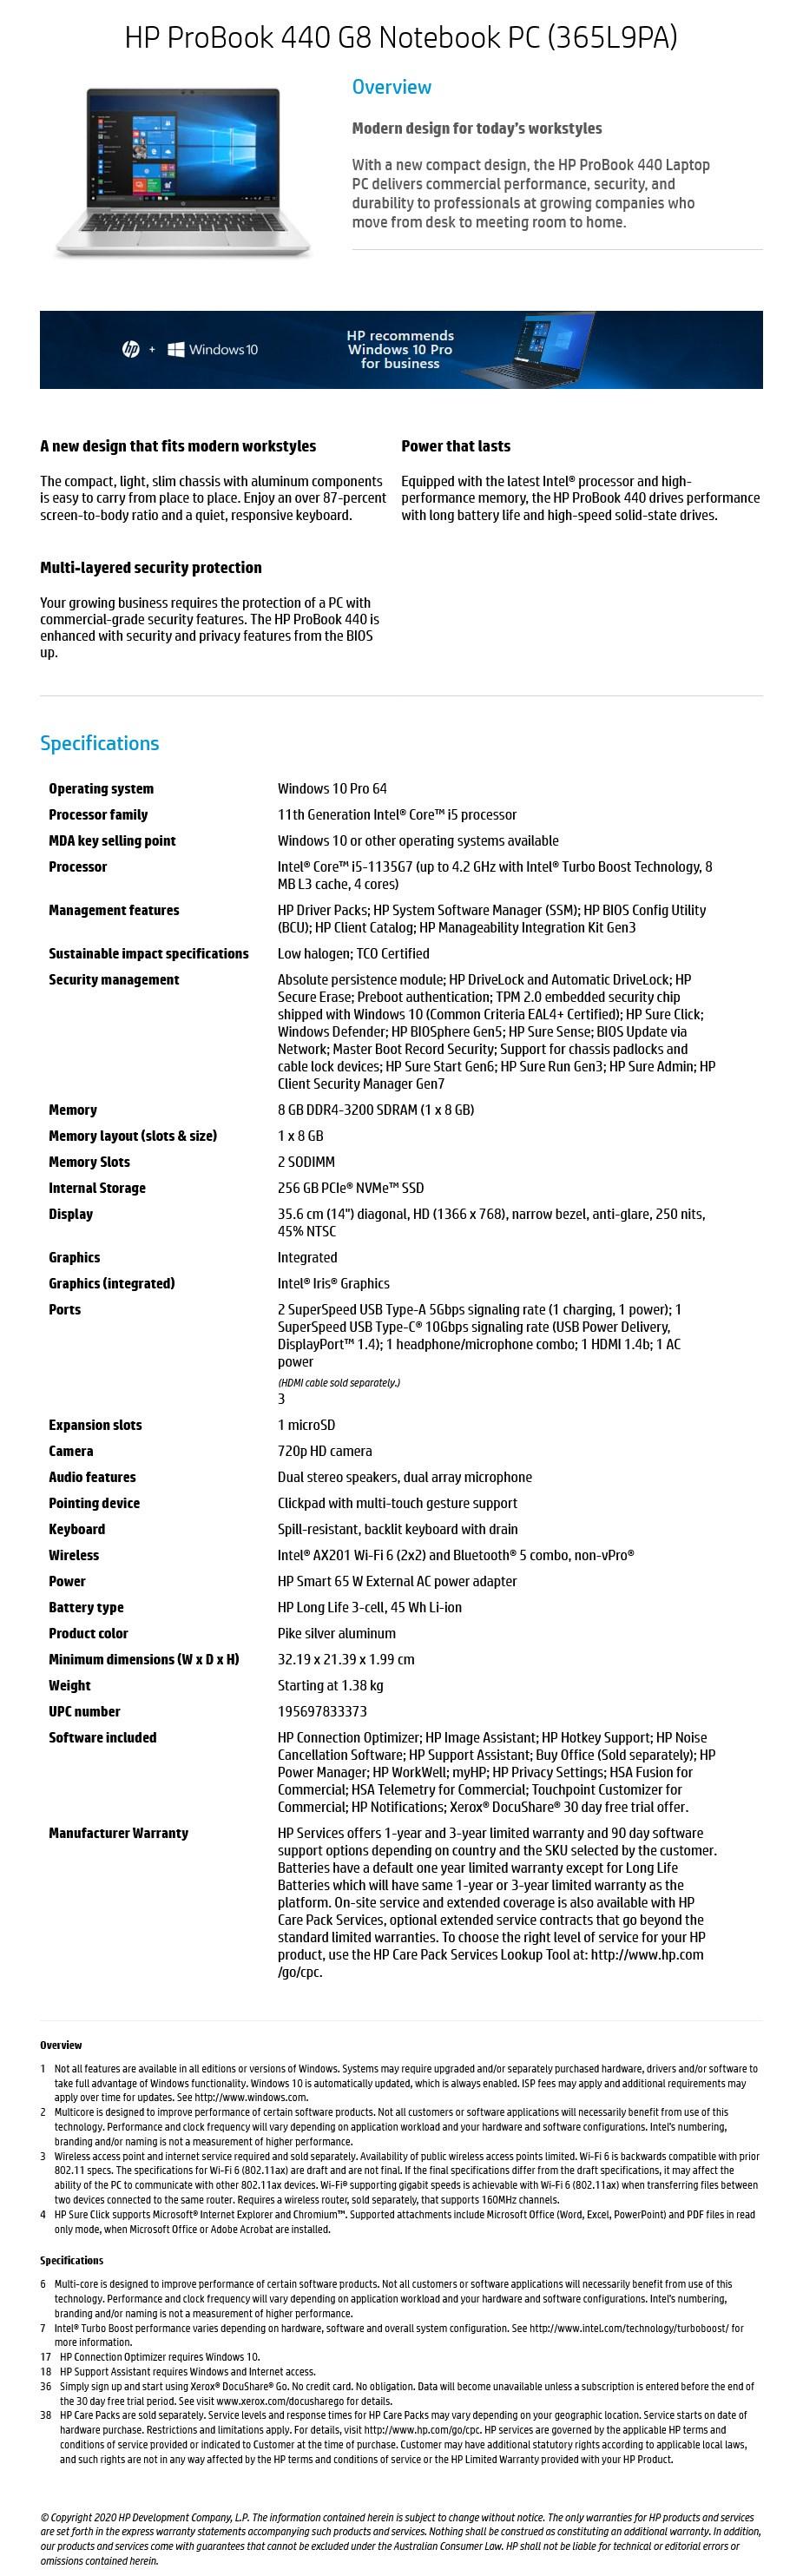 hp-probook-440-g8-14-laptop-i51135g7-8gb-256gb-ssd-w10p-4g-lte-ac44059-6.jpg